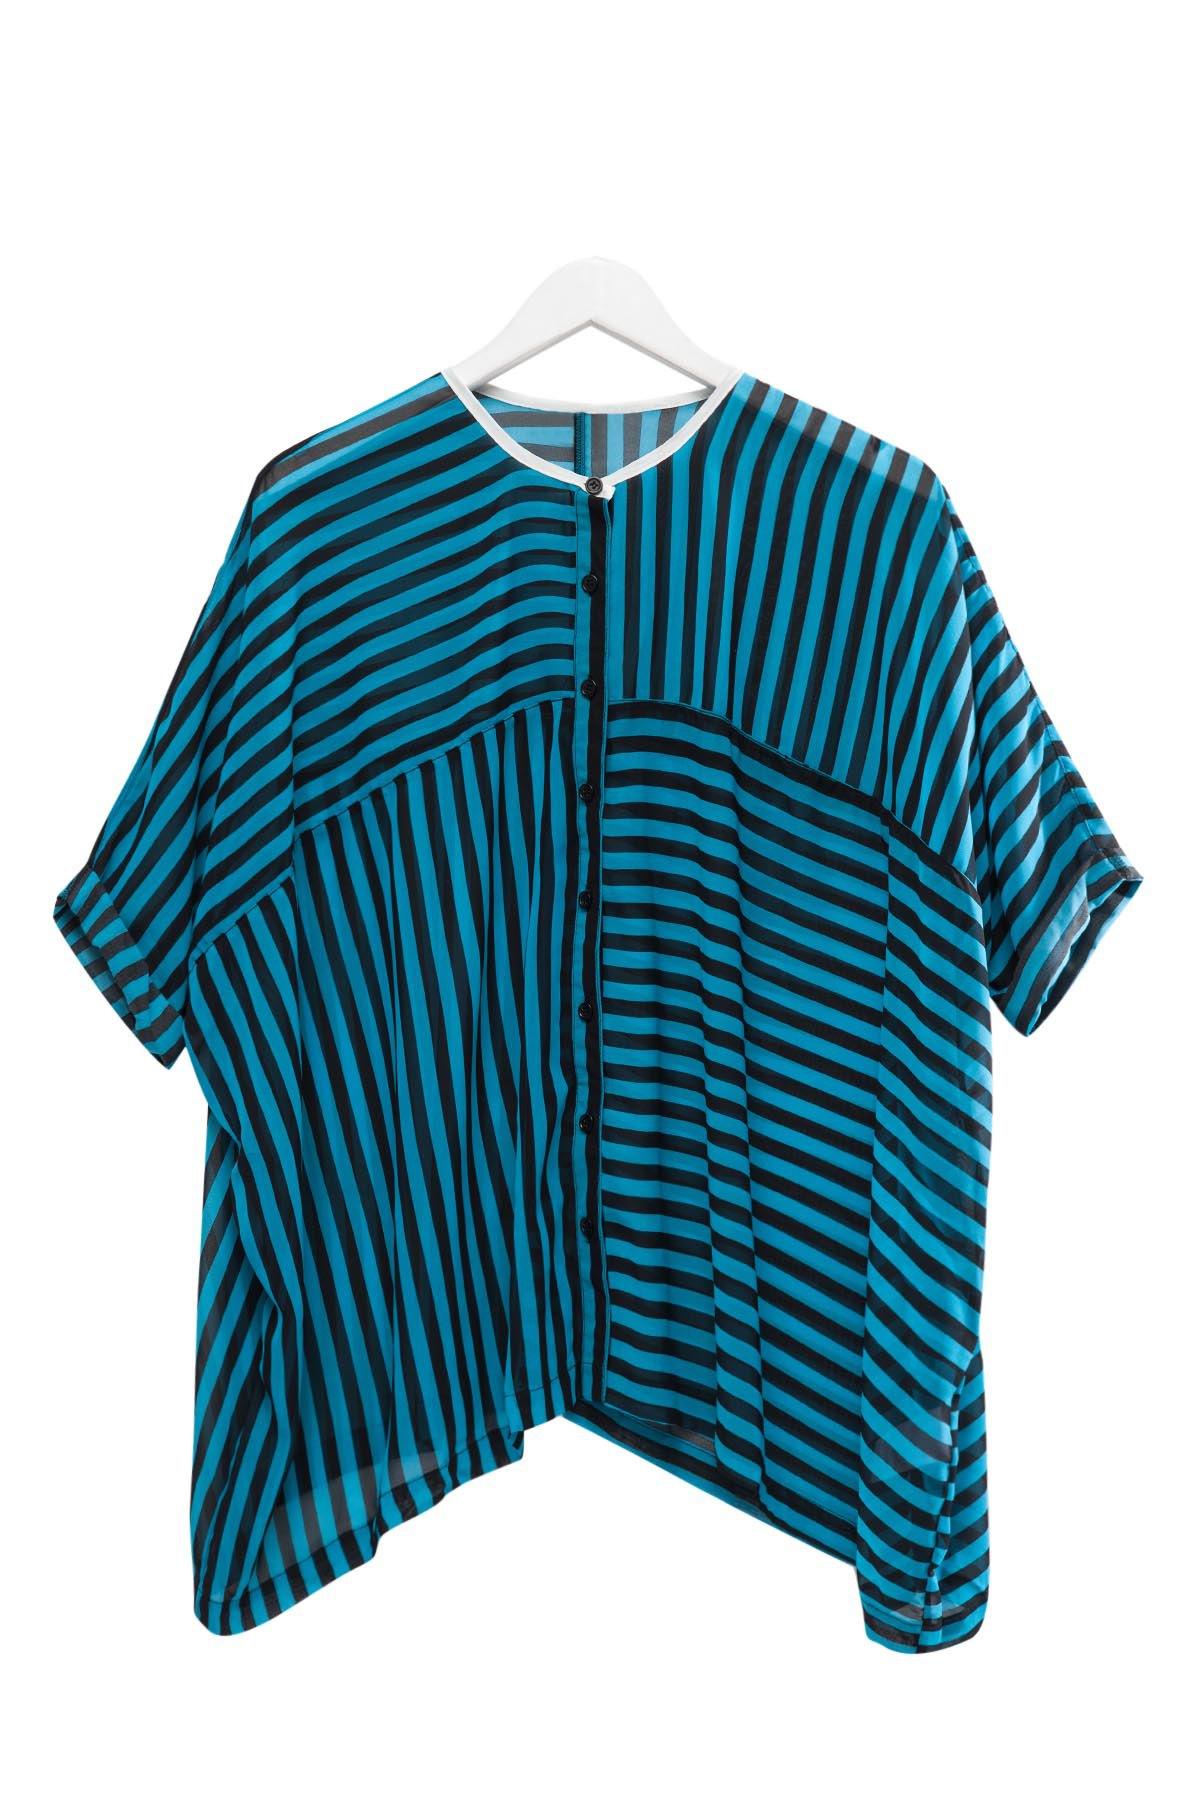 Stripe See-Through Half Sleeve Shirt